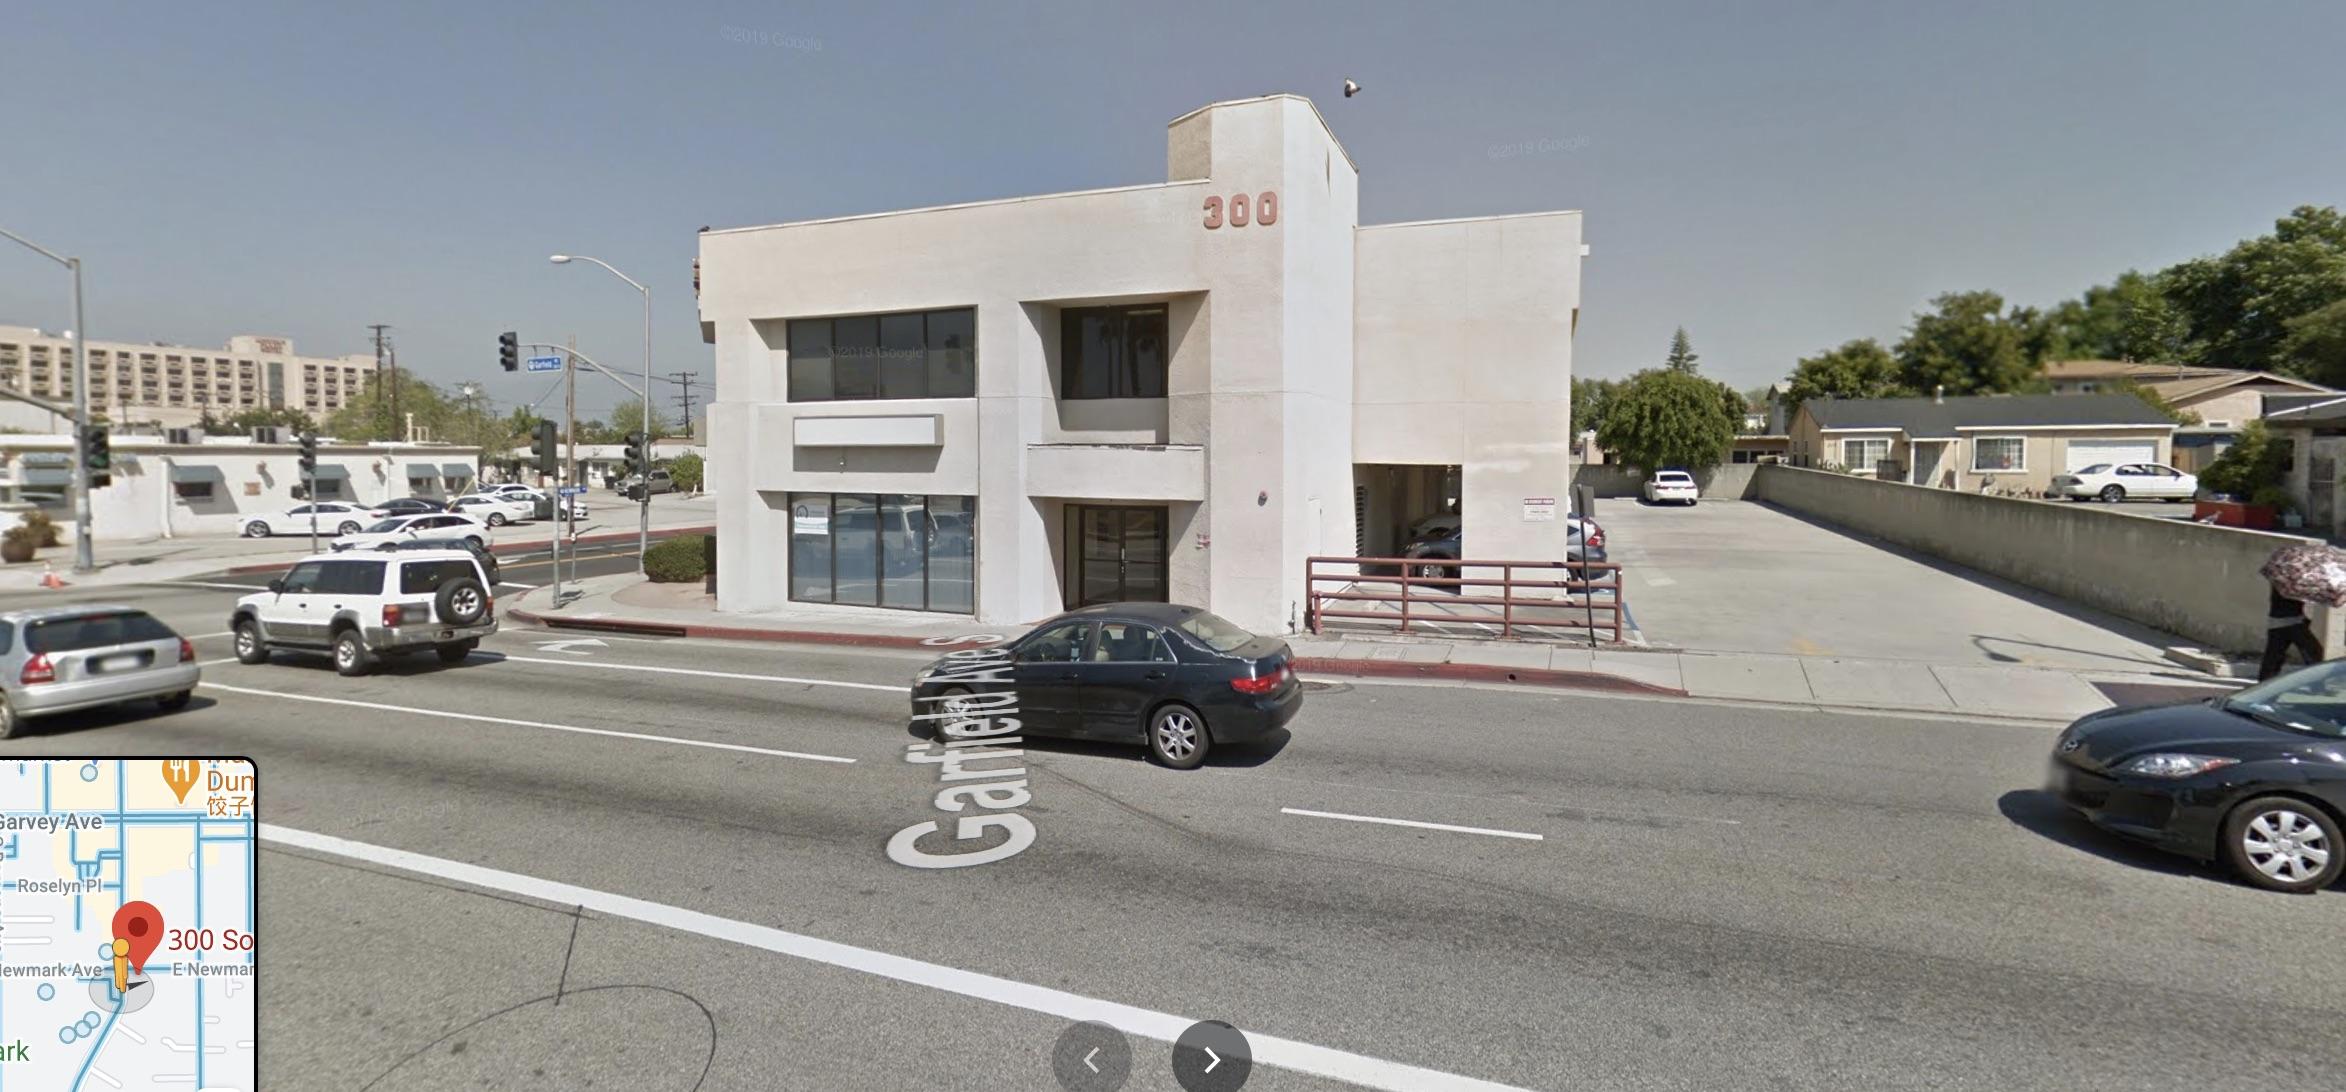 South Garfield Avenue 300棟附近發生槍擊案,搶手已經被逮捕。google街景圖